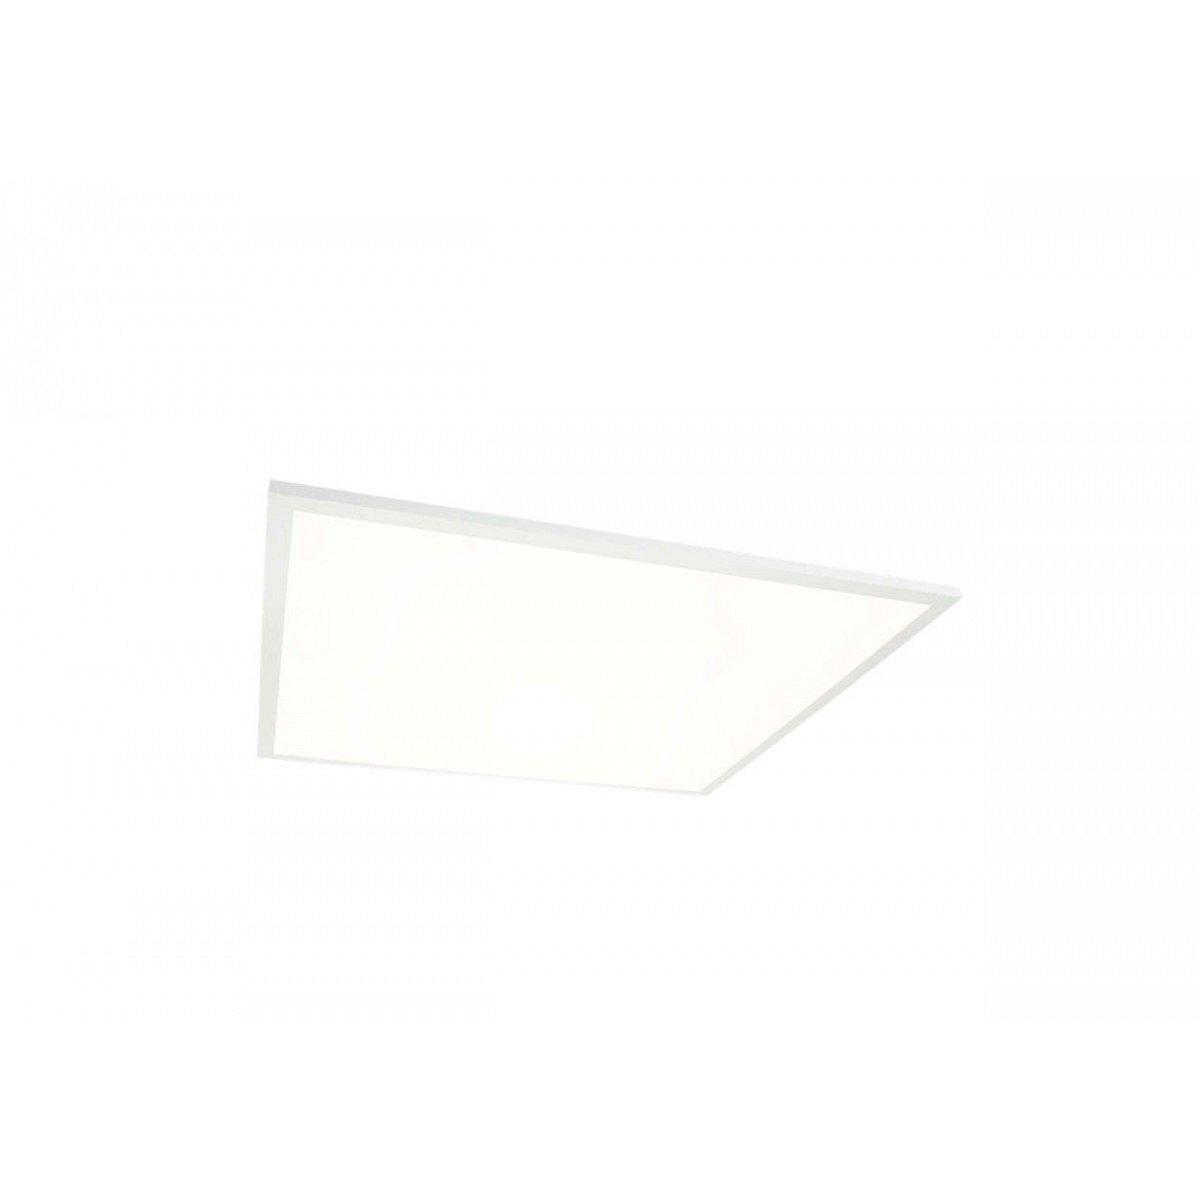 Panel LED Philips Ledinaire RC065B, 34 W, 3400 lm, IP 20